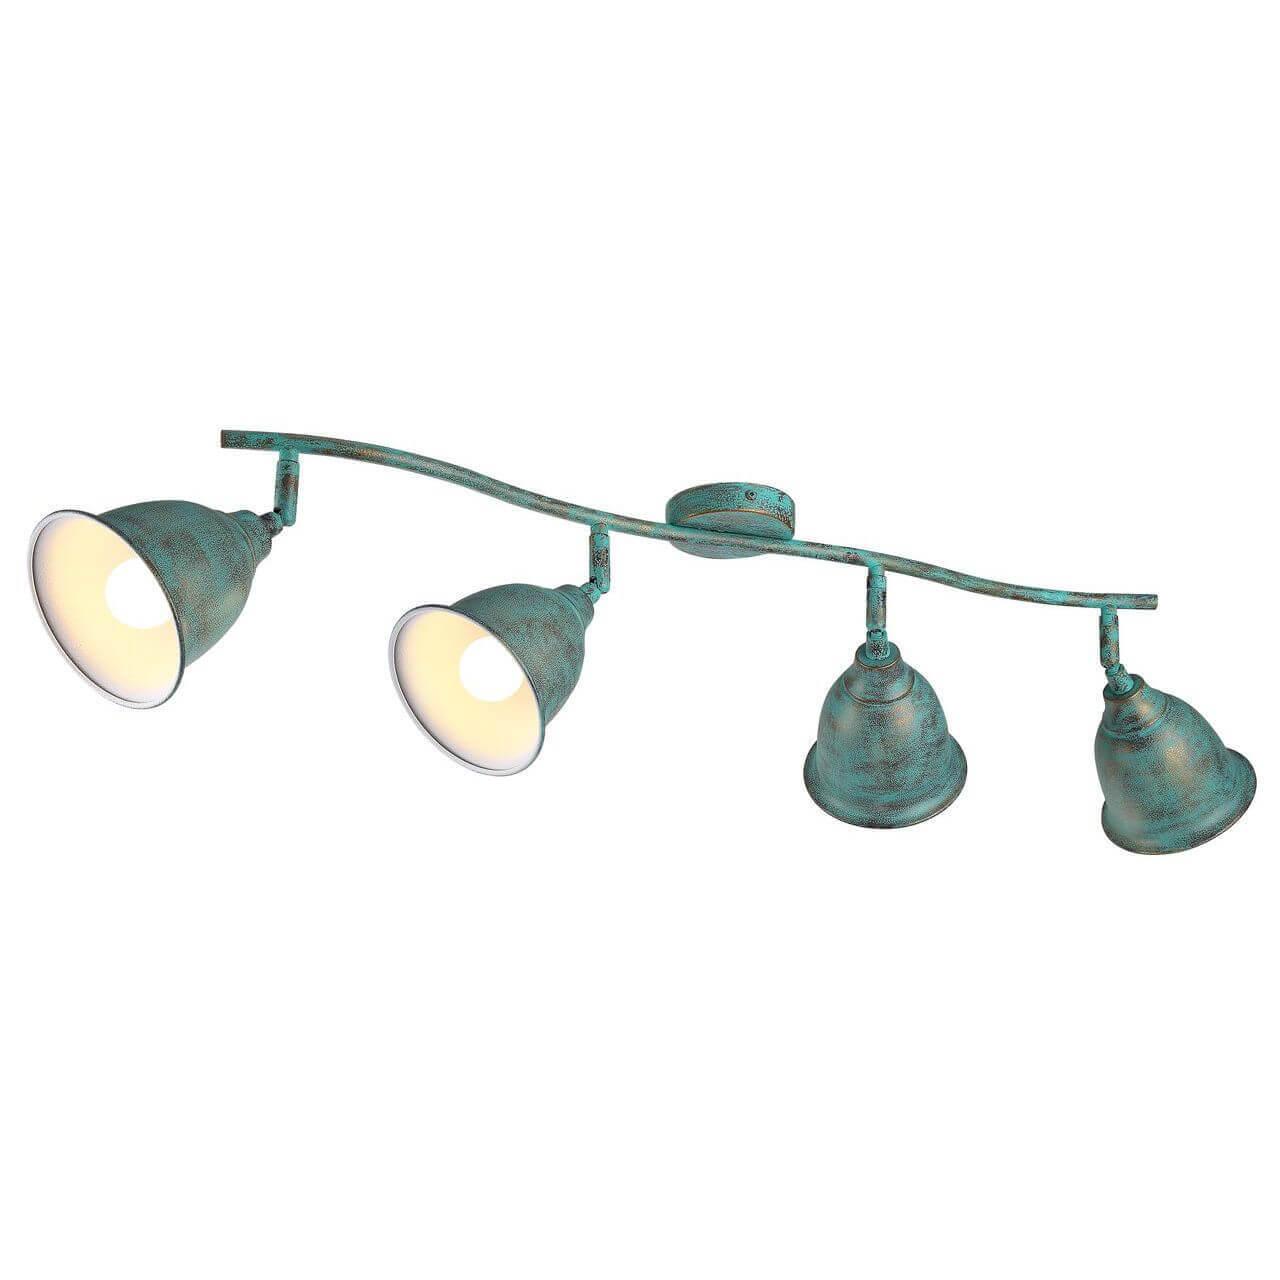 Спот Arte Lamp A9557PL-4BG Campana BG светильник спот arte lamp campana a9557pl 5bg